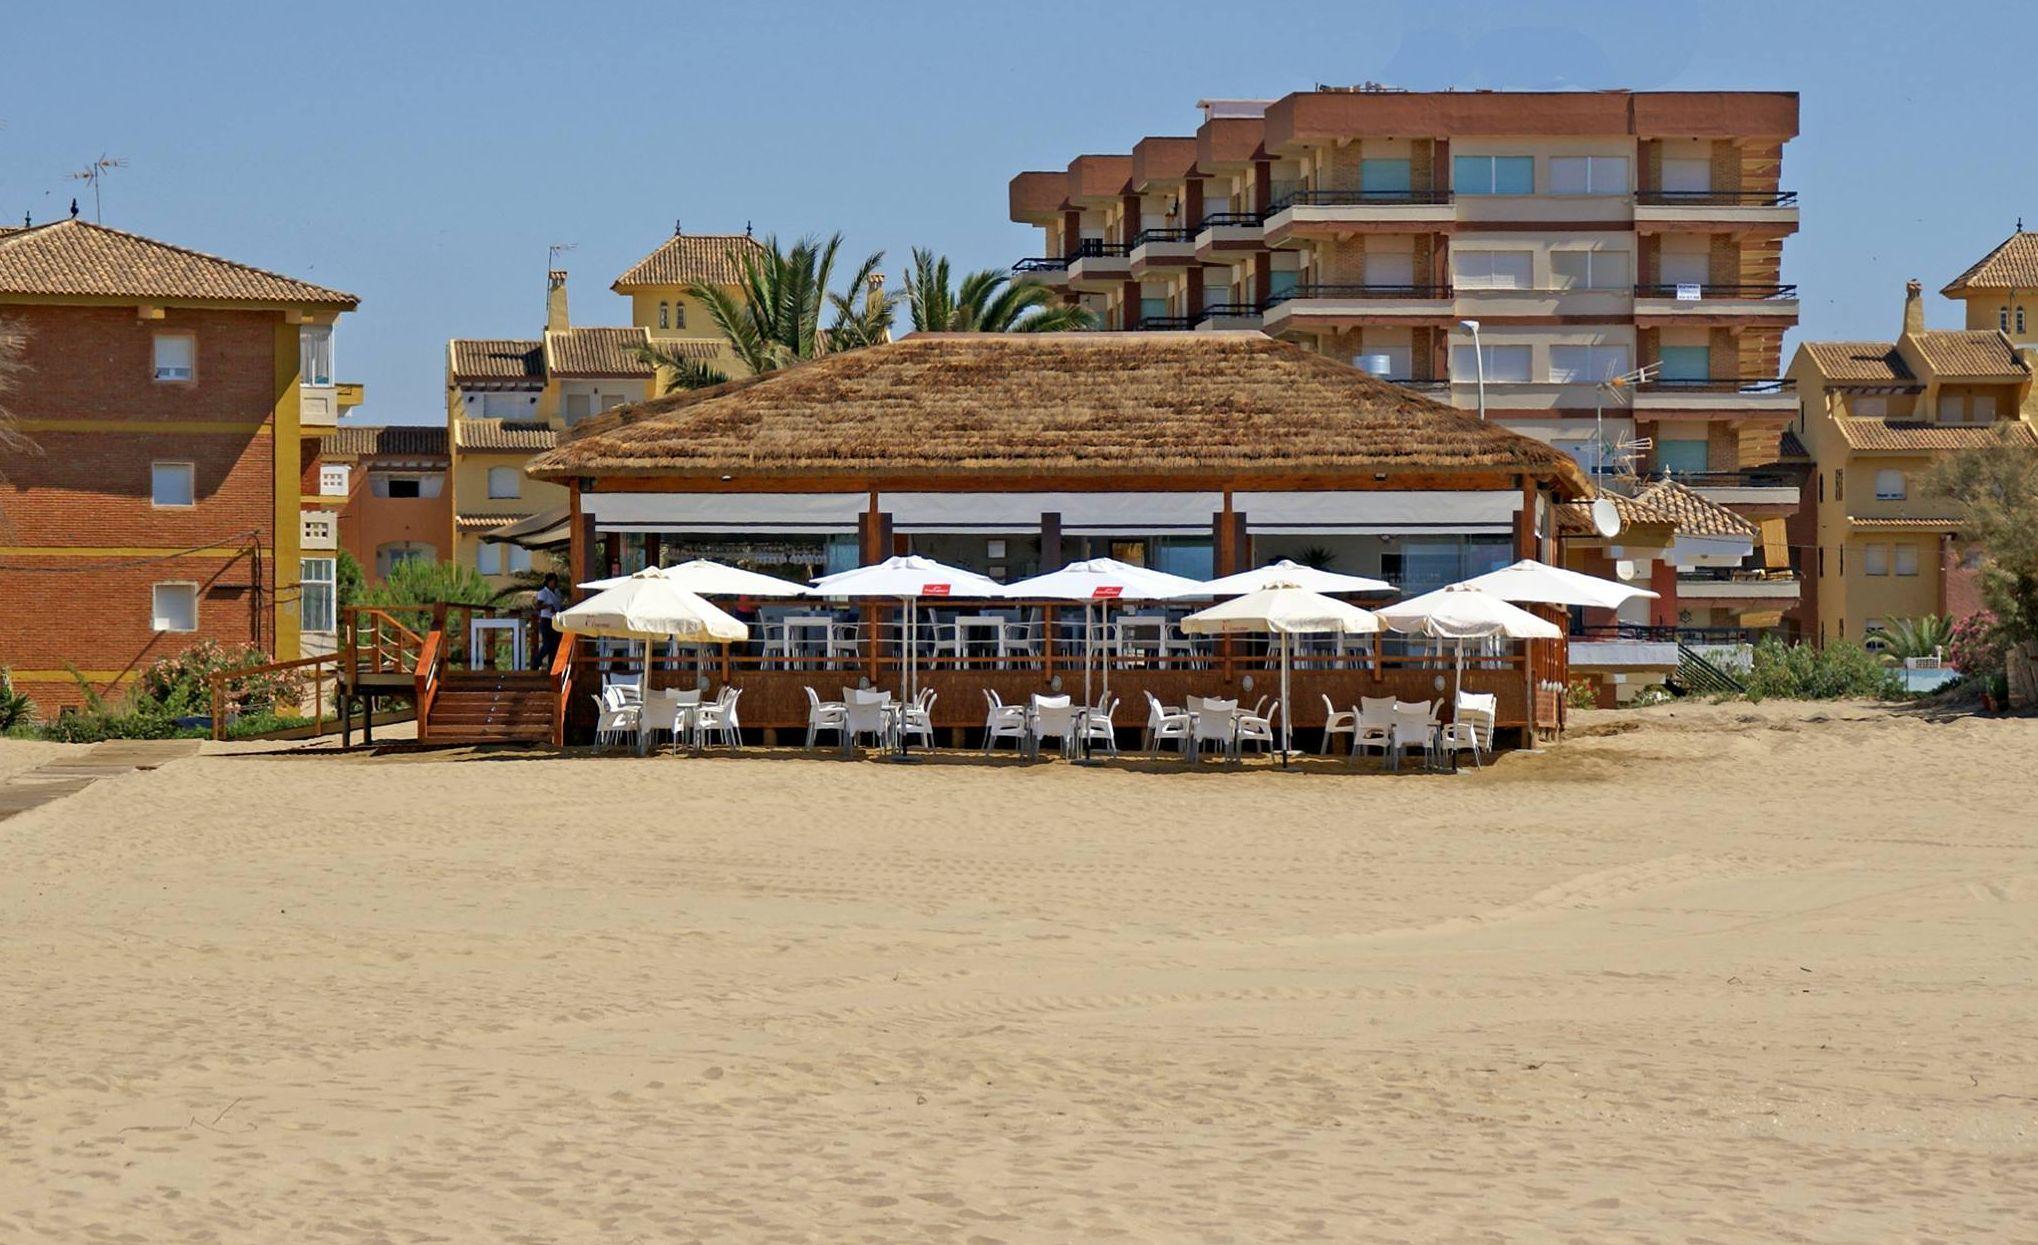 Cocina marinera en Isla Canela, Ayamonte (Huelva)